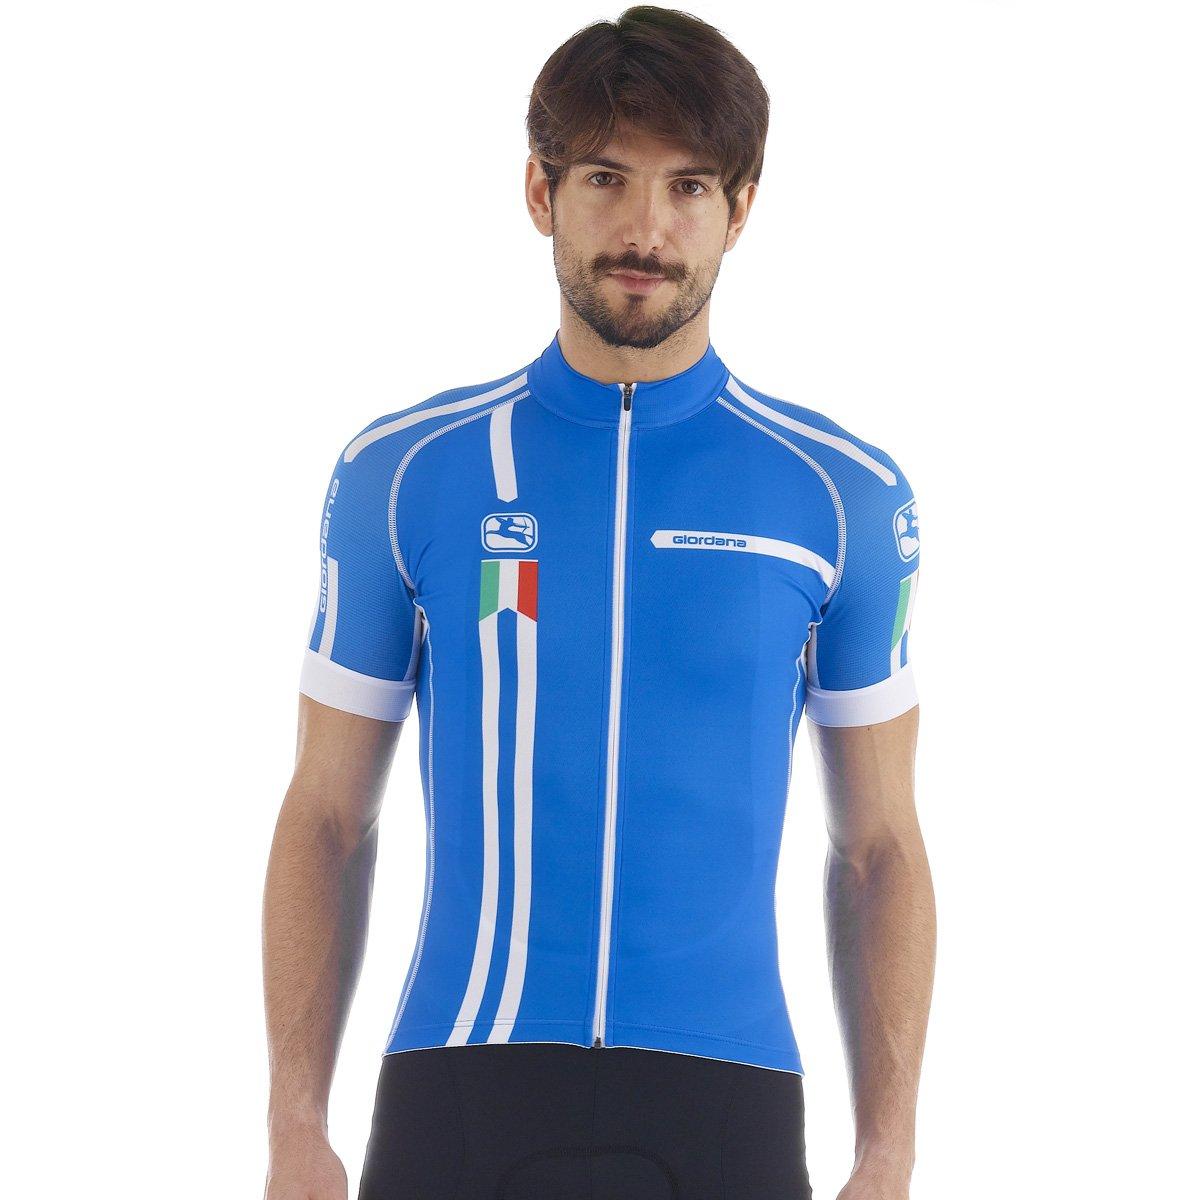 Giordana Mens Azzurro Trade Scatto Short Sleeve Cycling Jersey GI-S5-SSSC-AZZU